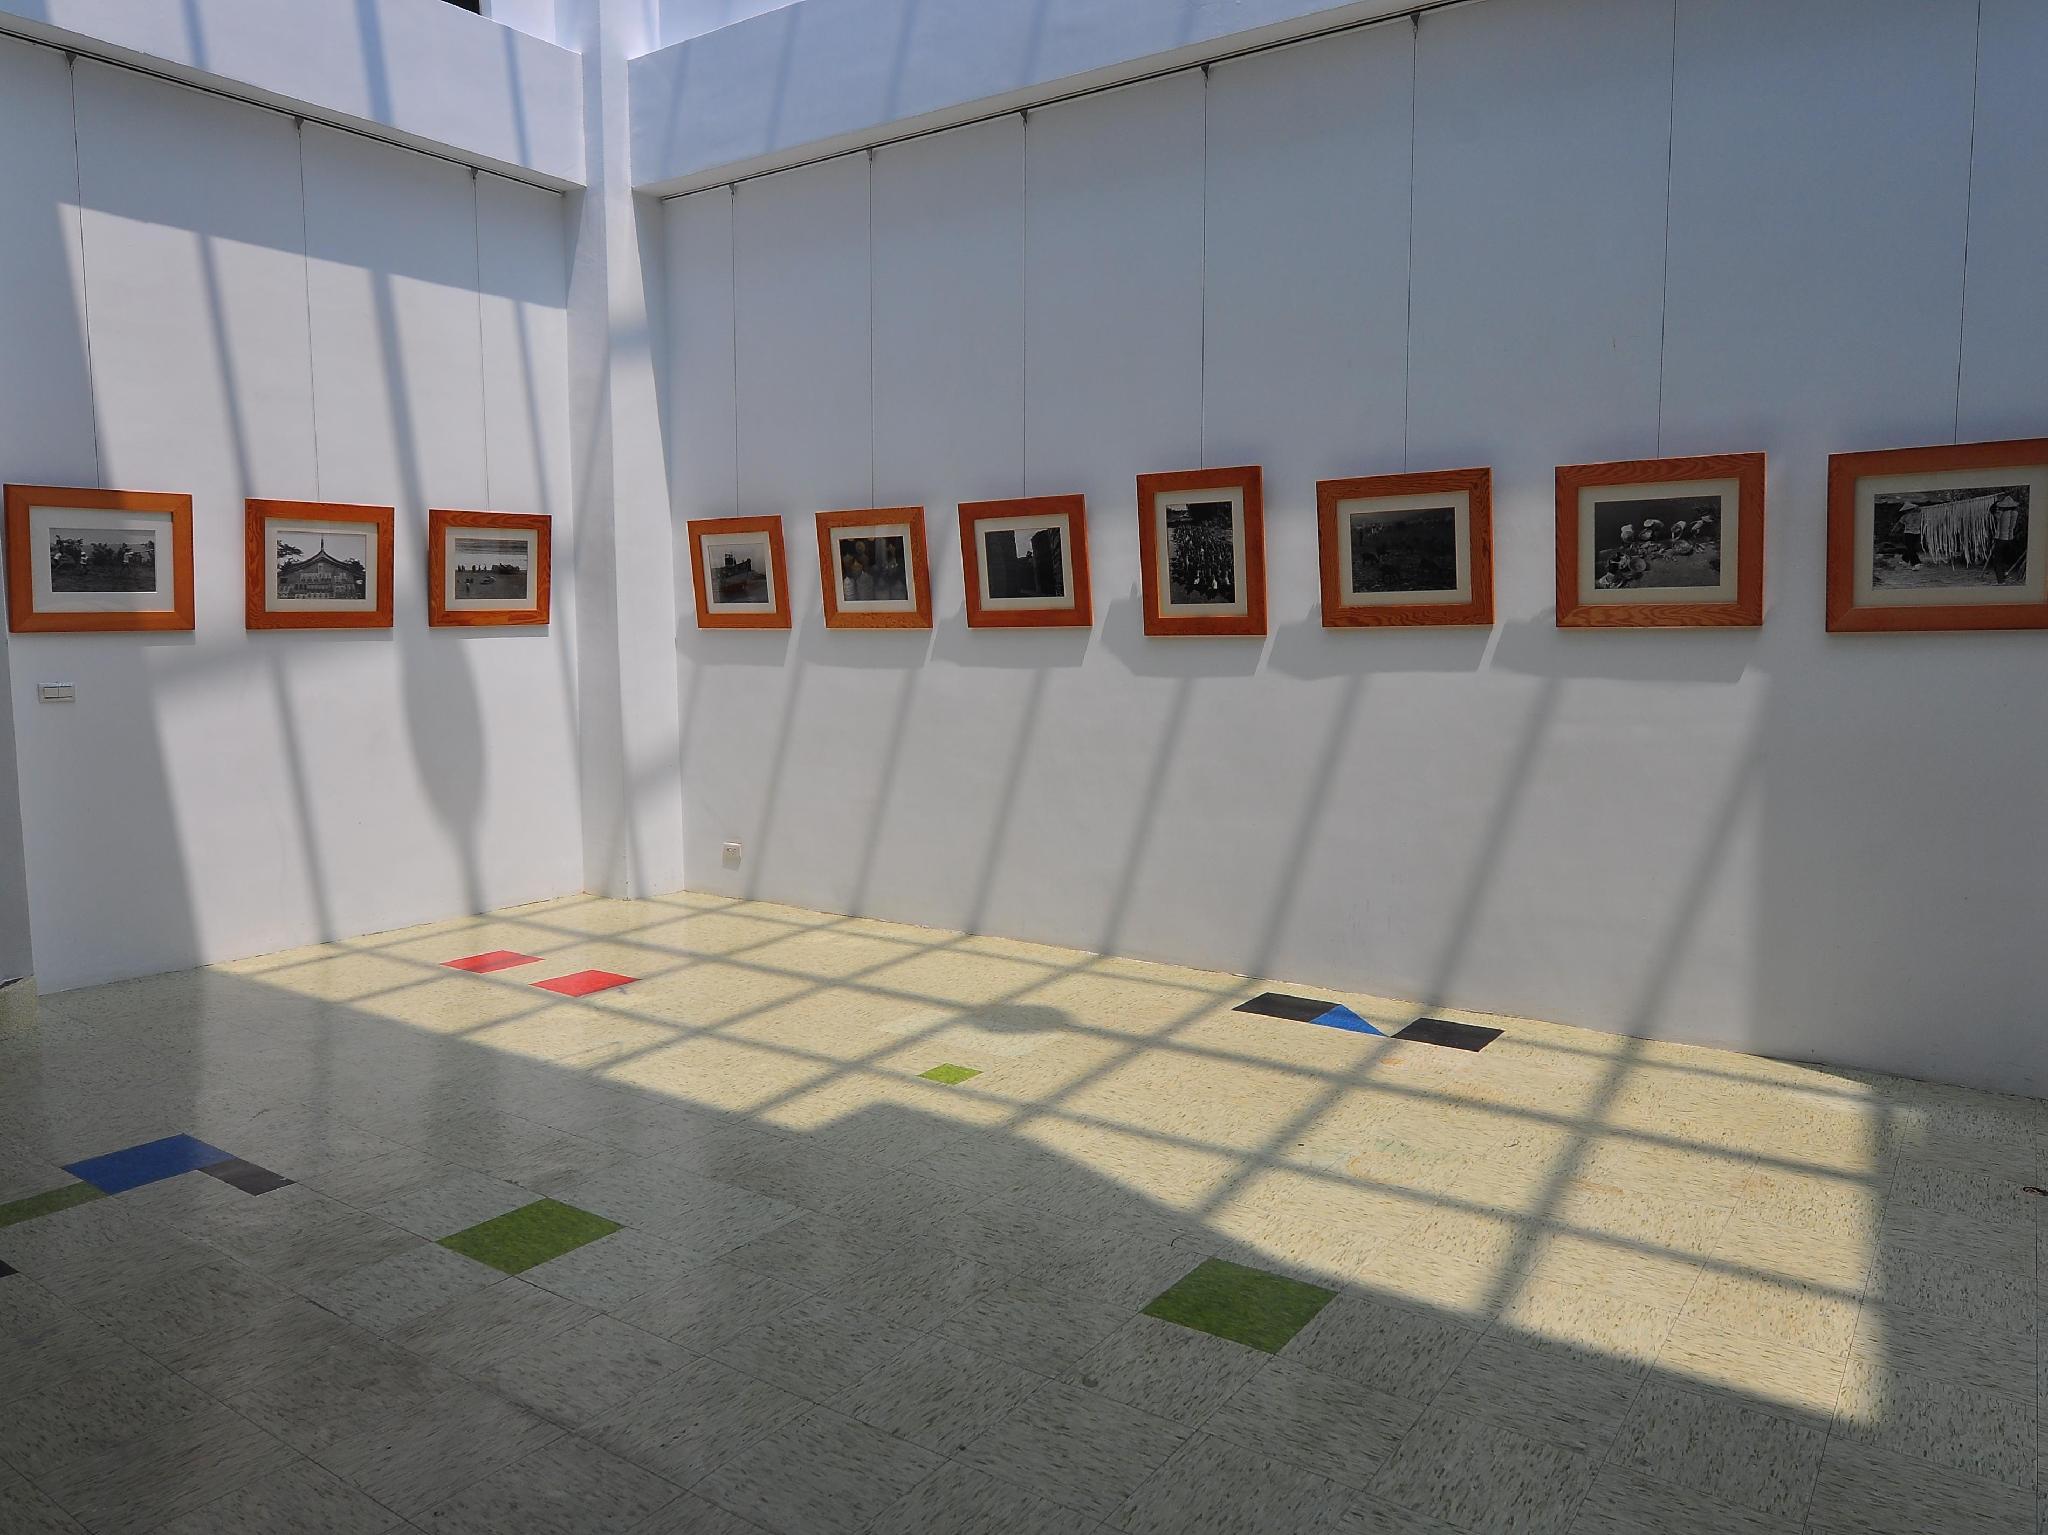 The Art Gallery B&B